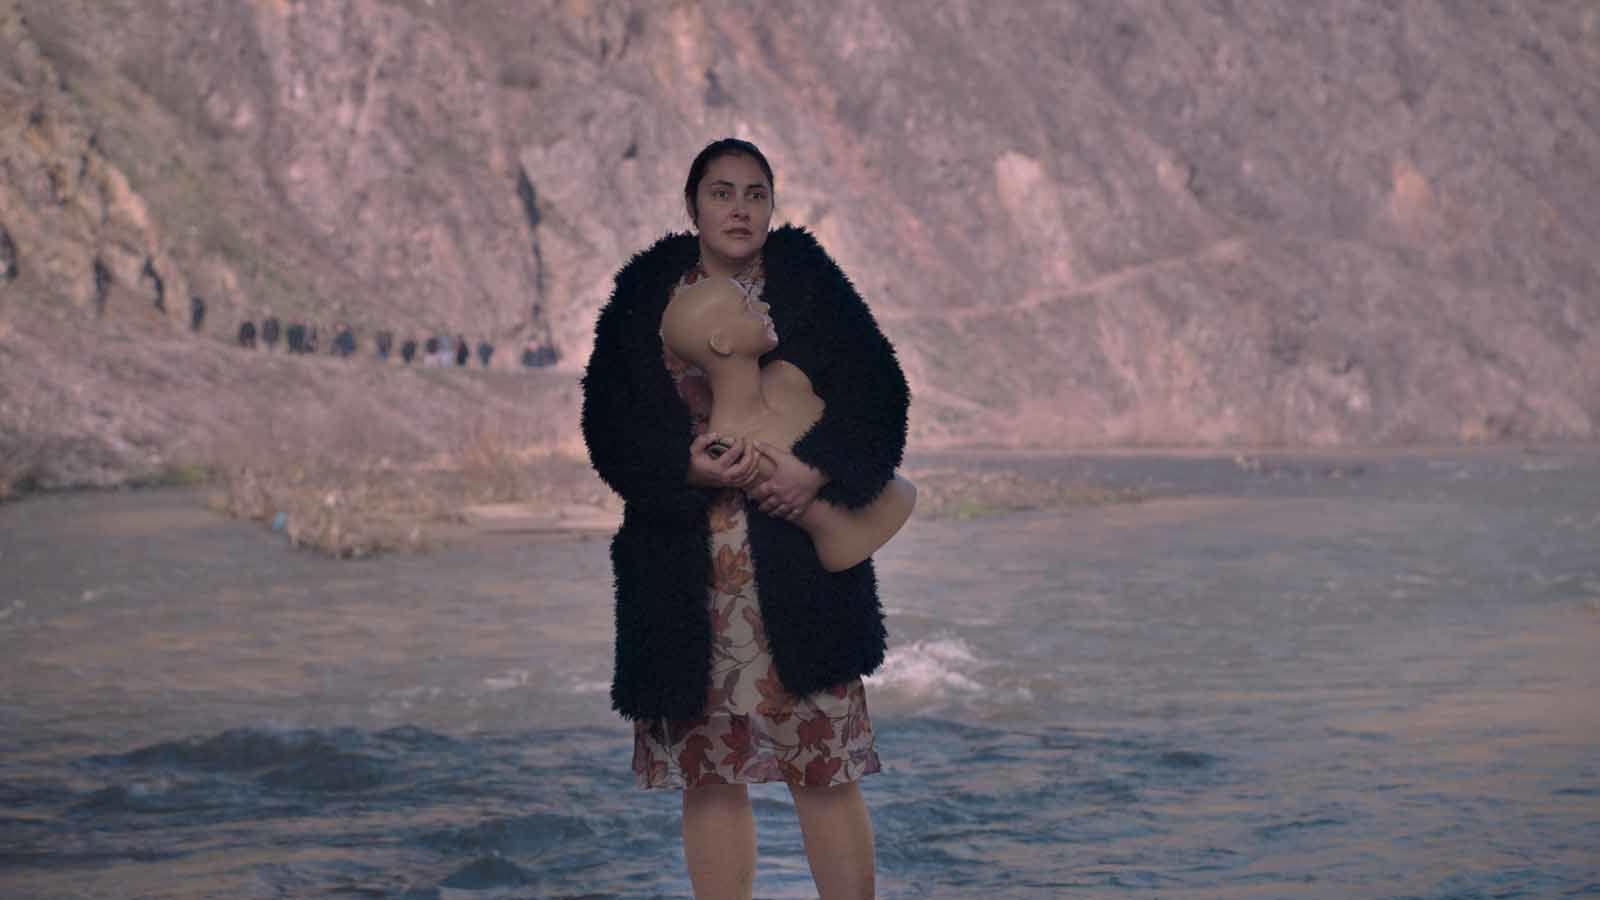 Dieu existe, son nom est Petrunya (BANDE-ANNONCE) de Teona Strugar Mitevska - Le 1er mai 2019 au cinéma